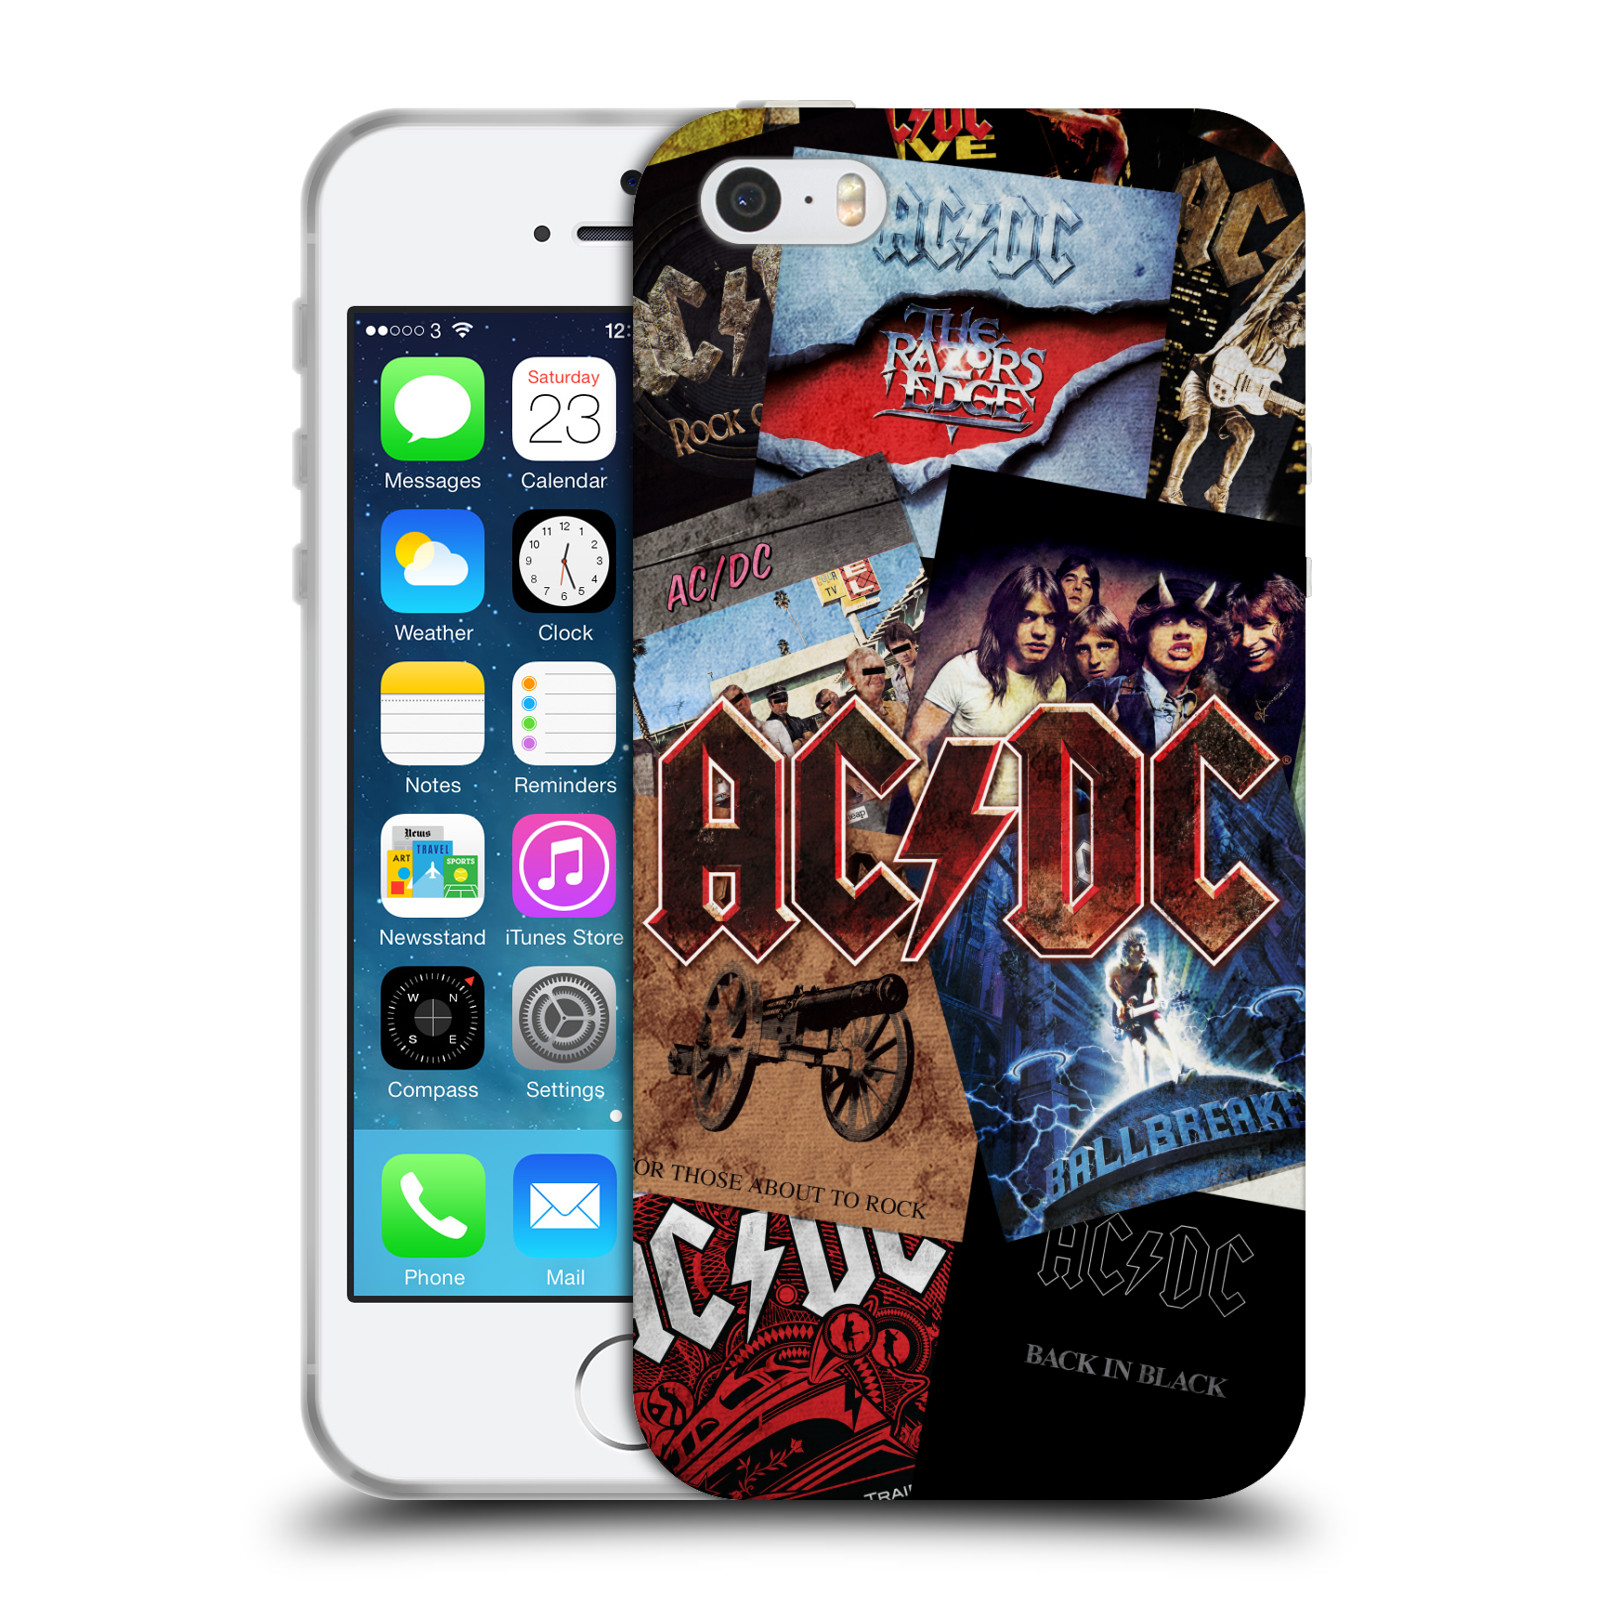 Silikonové pouzdro na mobil Apple iPhone 5, 5S, SE - Head Case - AC/DC Koláž desek